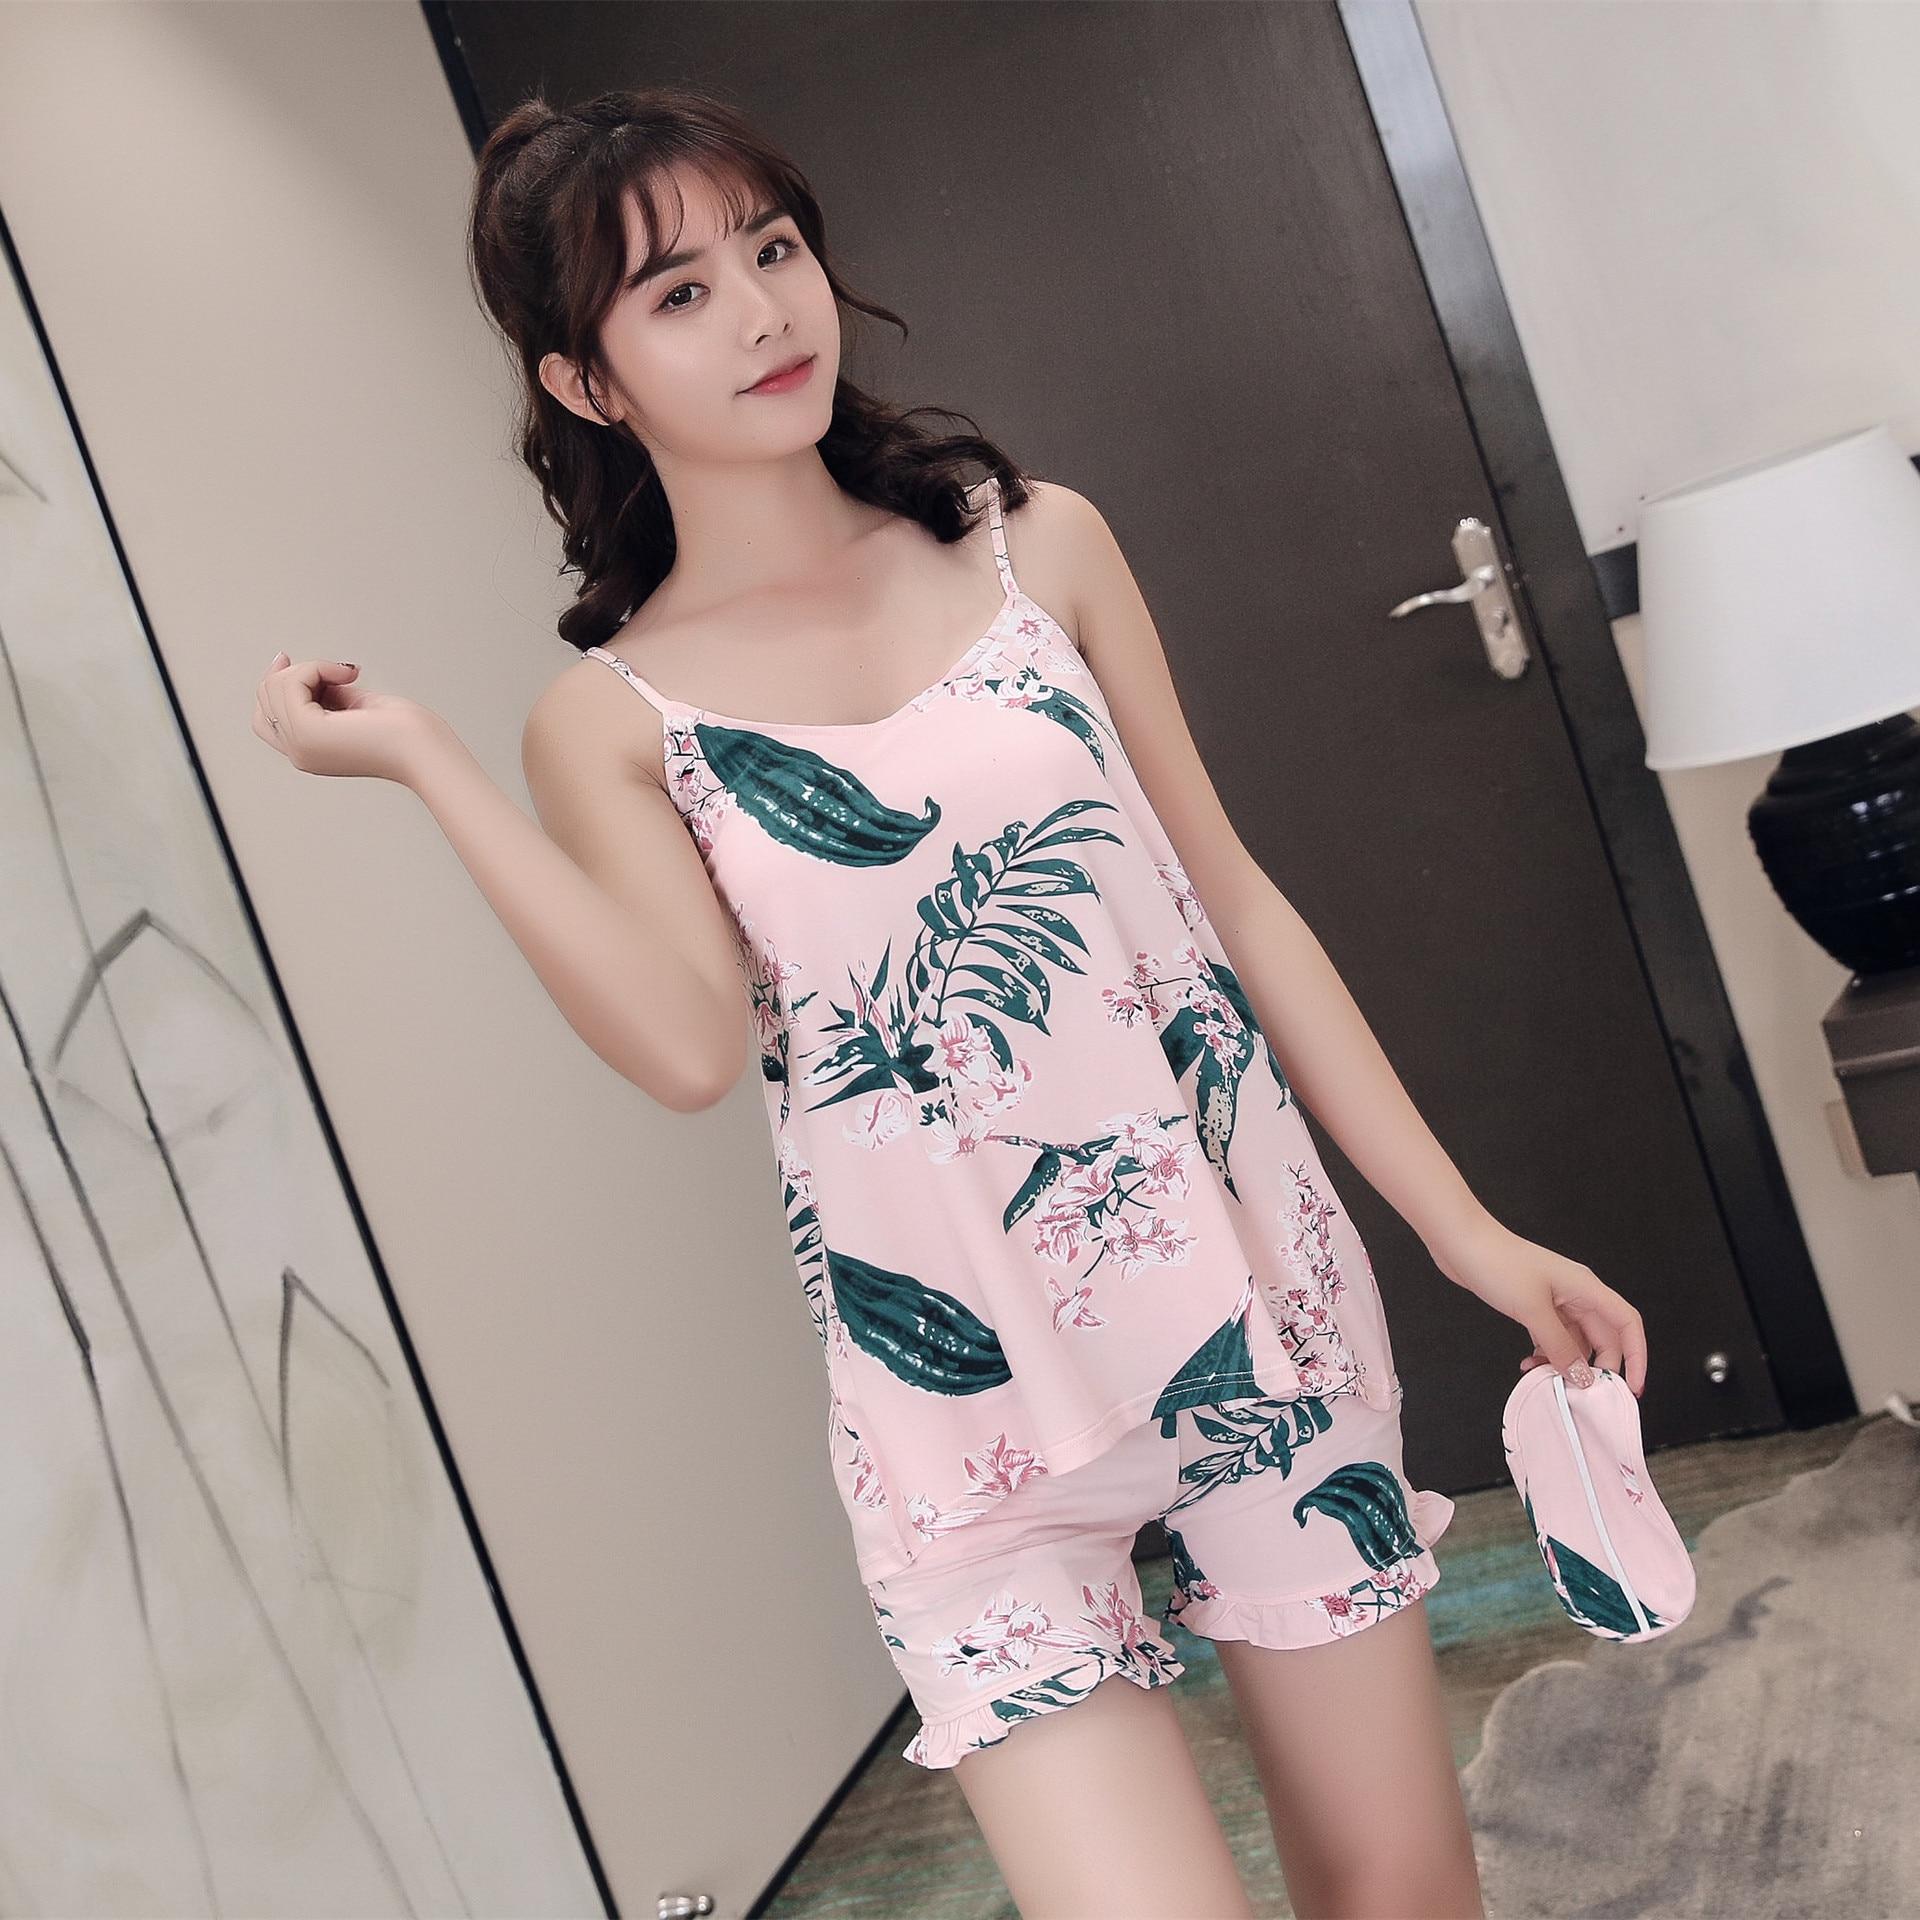 2020 Womens Pajamas Sets V-Neck Summer Sleeveless Cami Tops + Shorts 2 Pcs Pyjamas With Chest Pad Student Pajamas Sets Pj Set